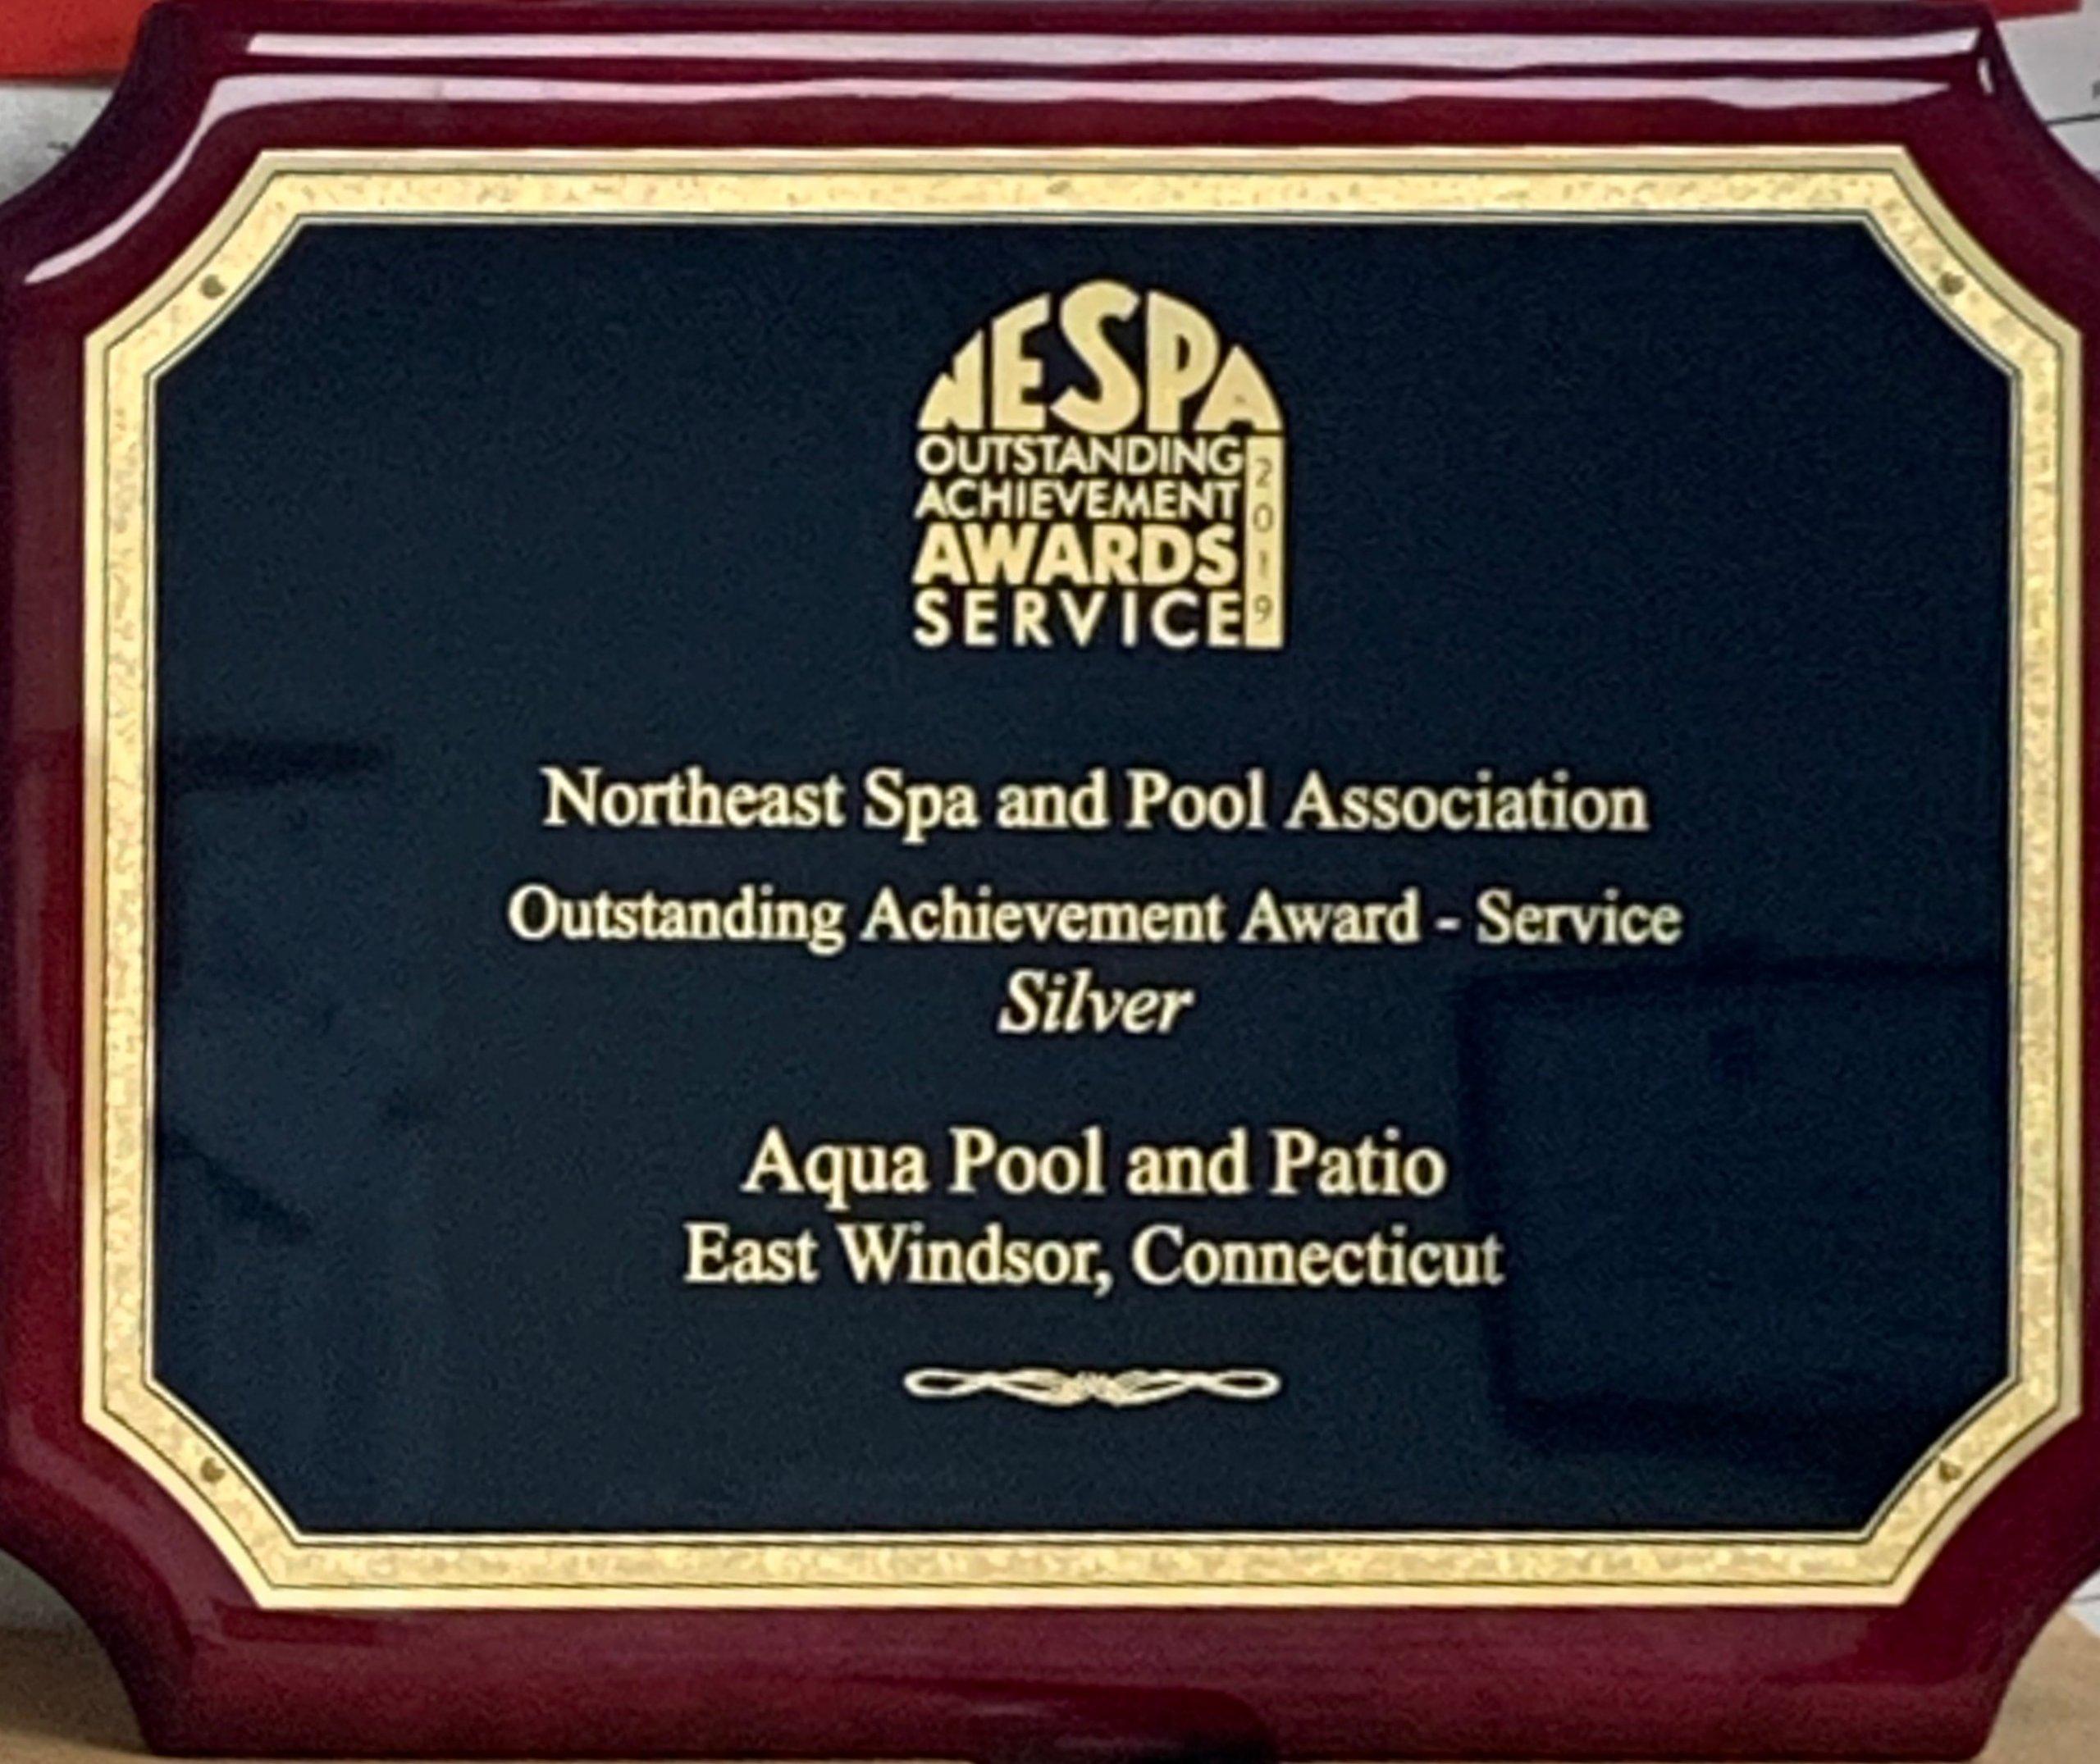 Aqua Pool Receives NESPA Outstanding Achievement Award